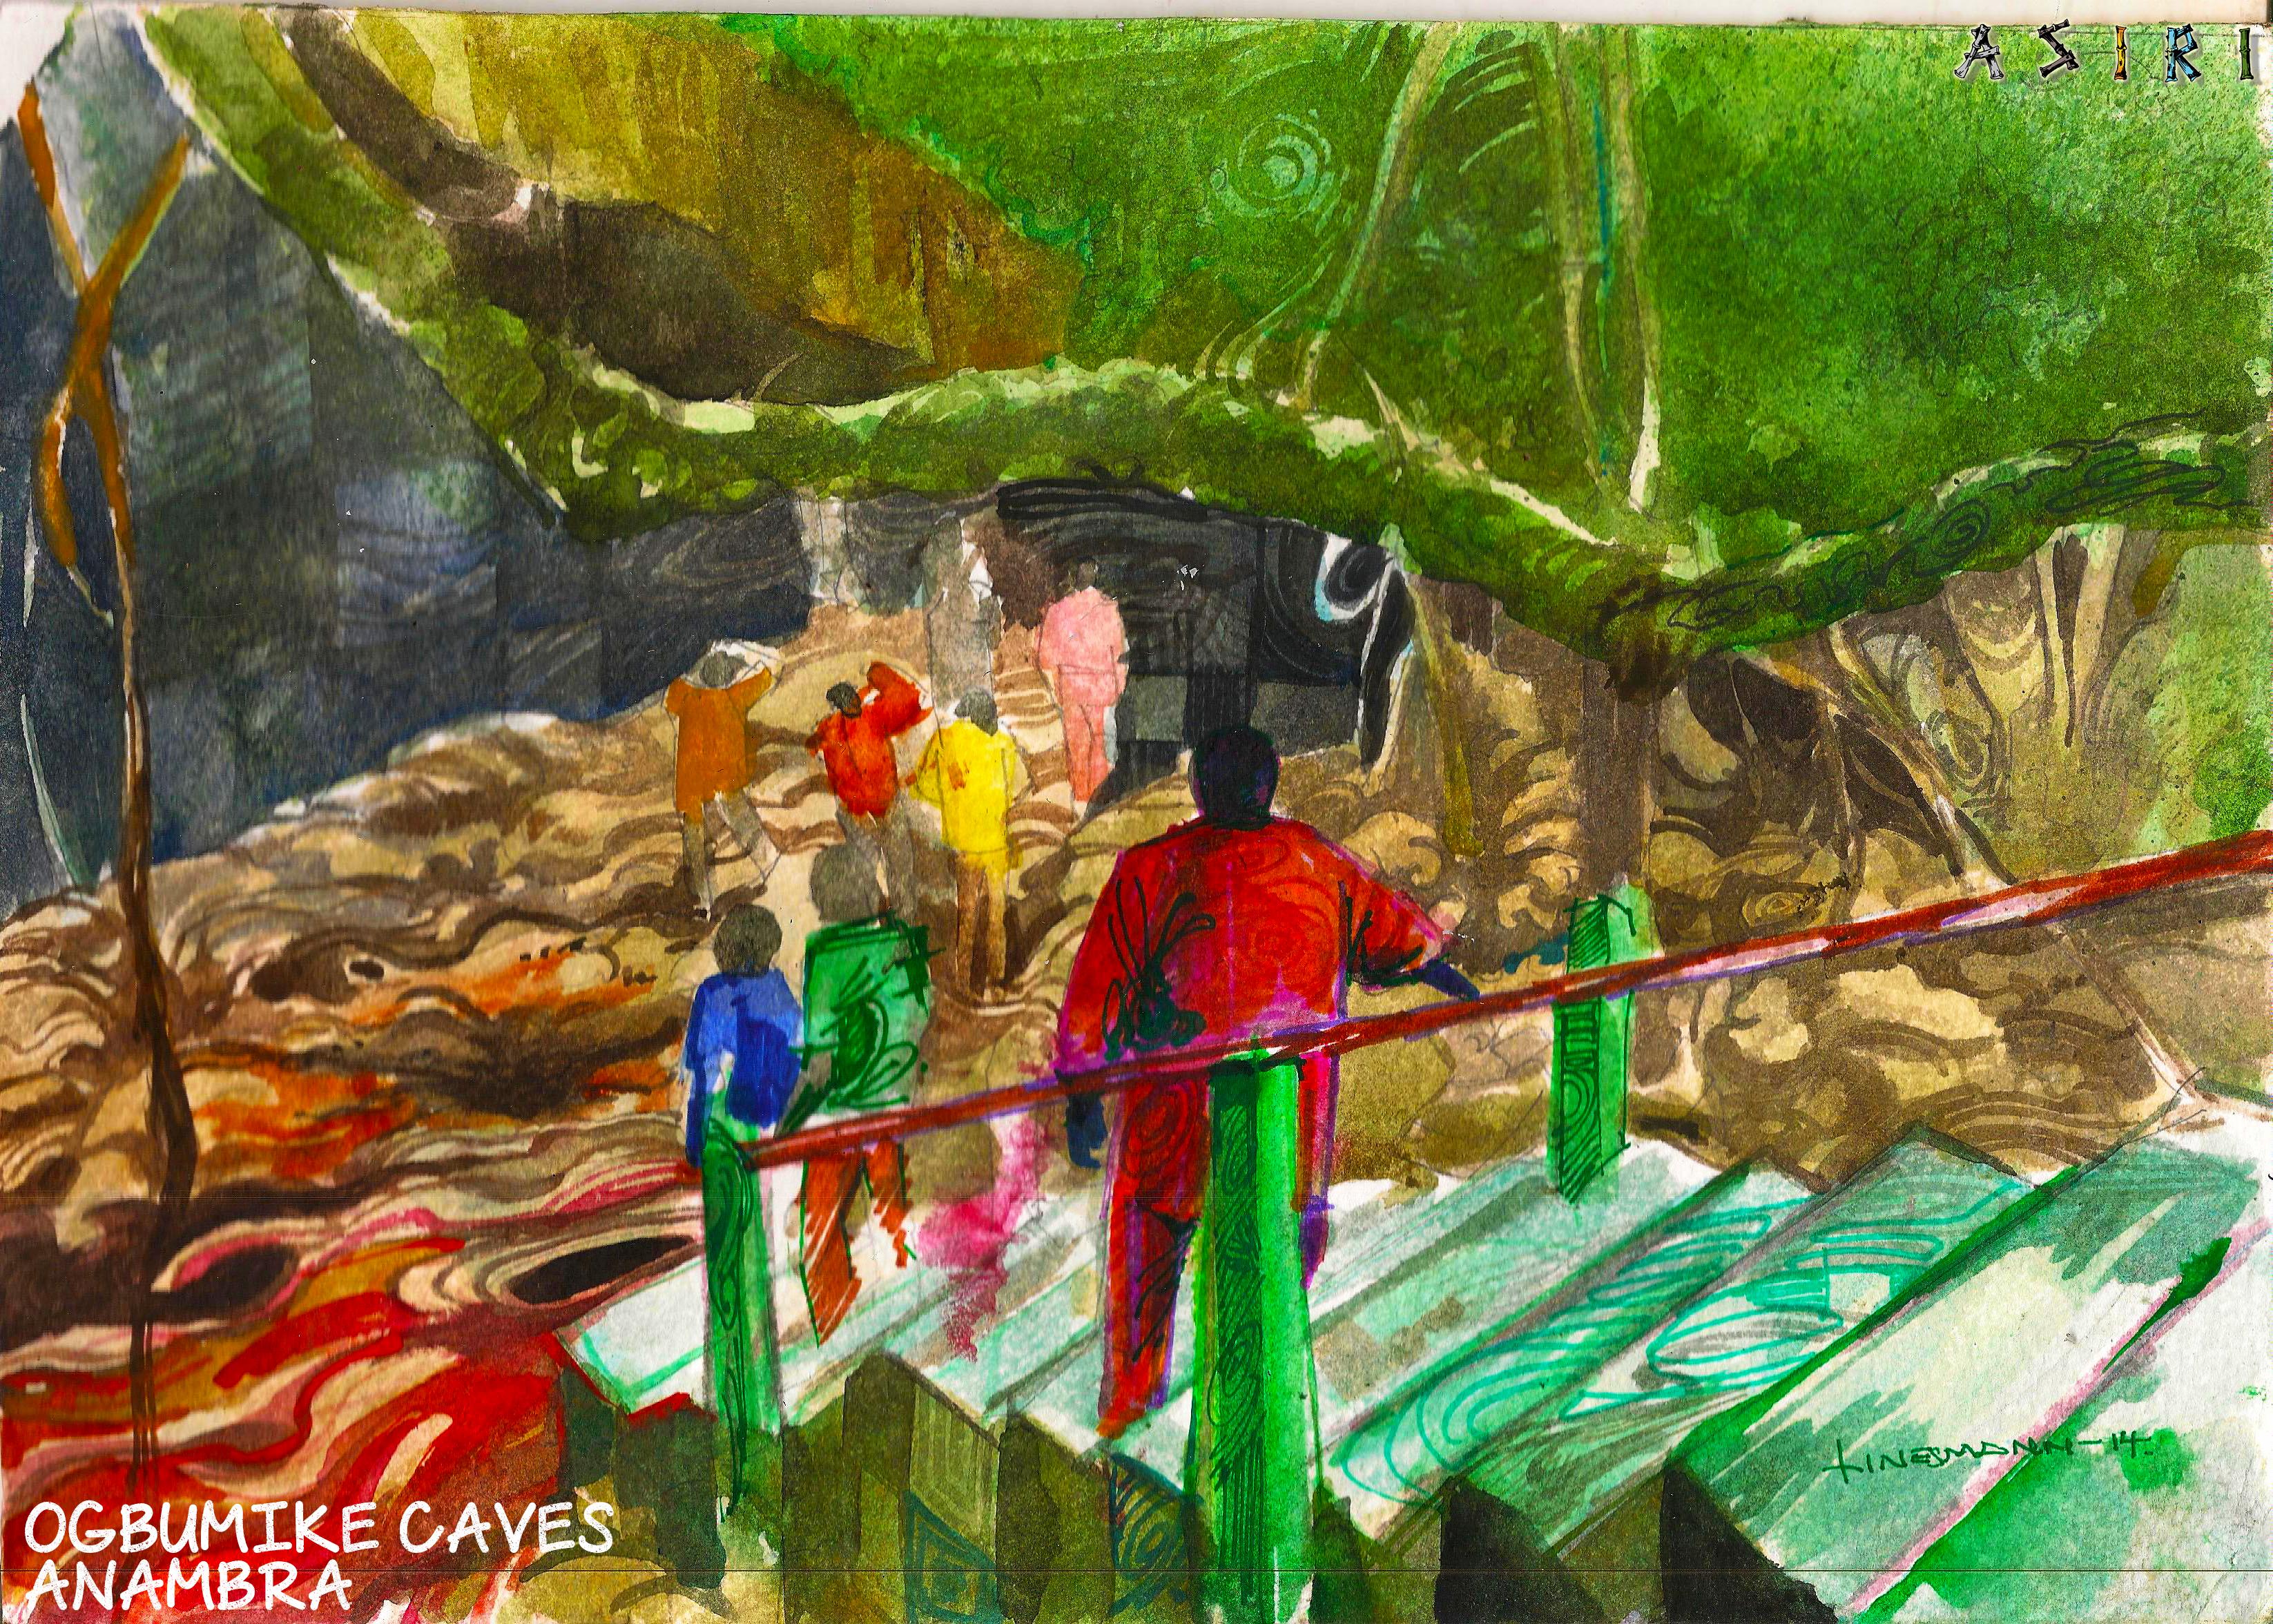 Ogbumike Caves Anambra